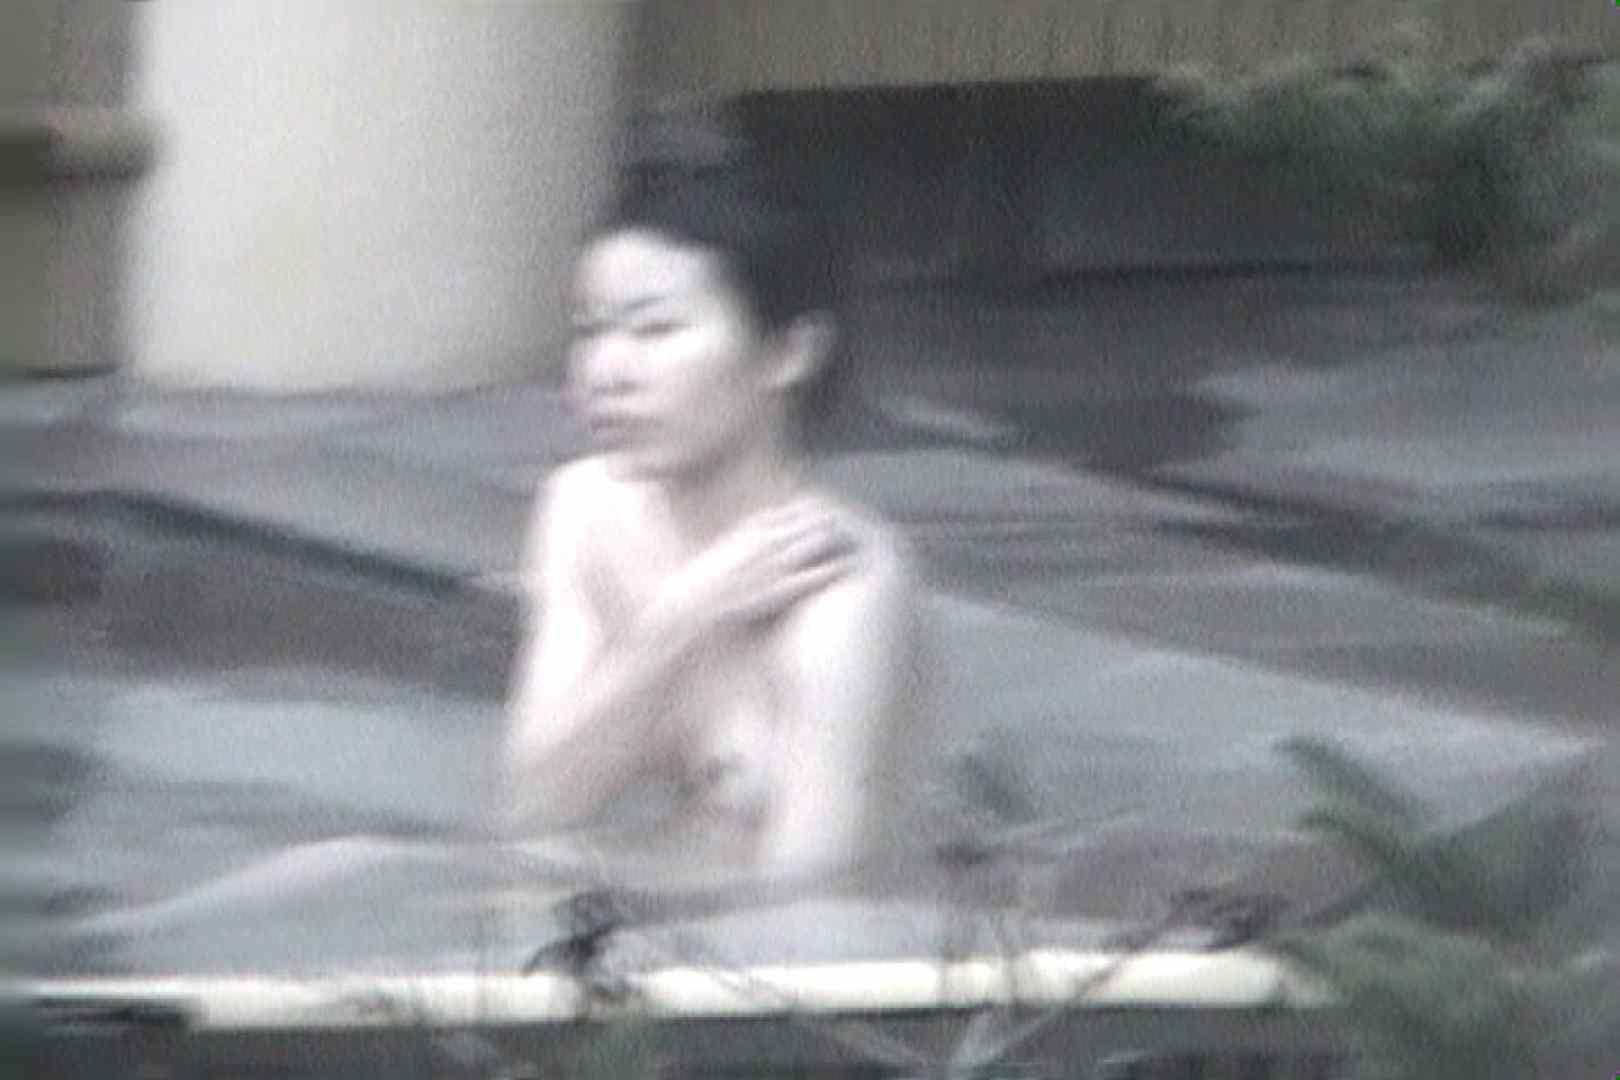 Aquaな露天風呂Vol.556 露天風呂編 | 盗撮シリーズ  99PIX 45